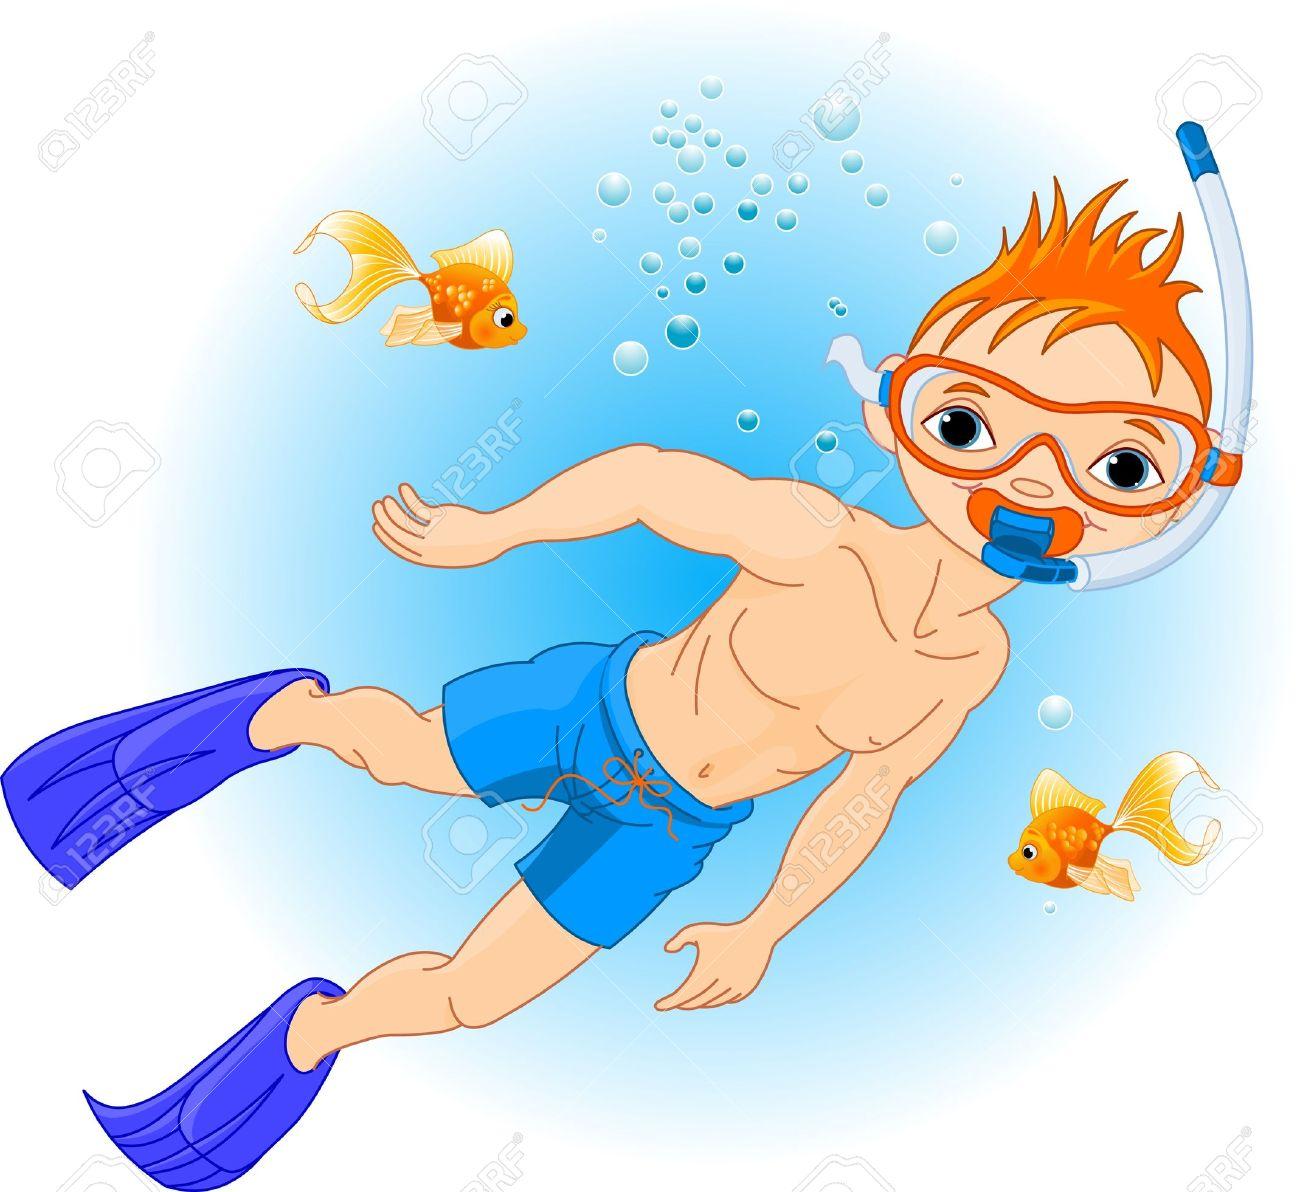 Boy scuba diving clipart.